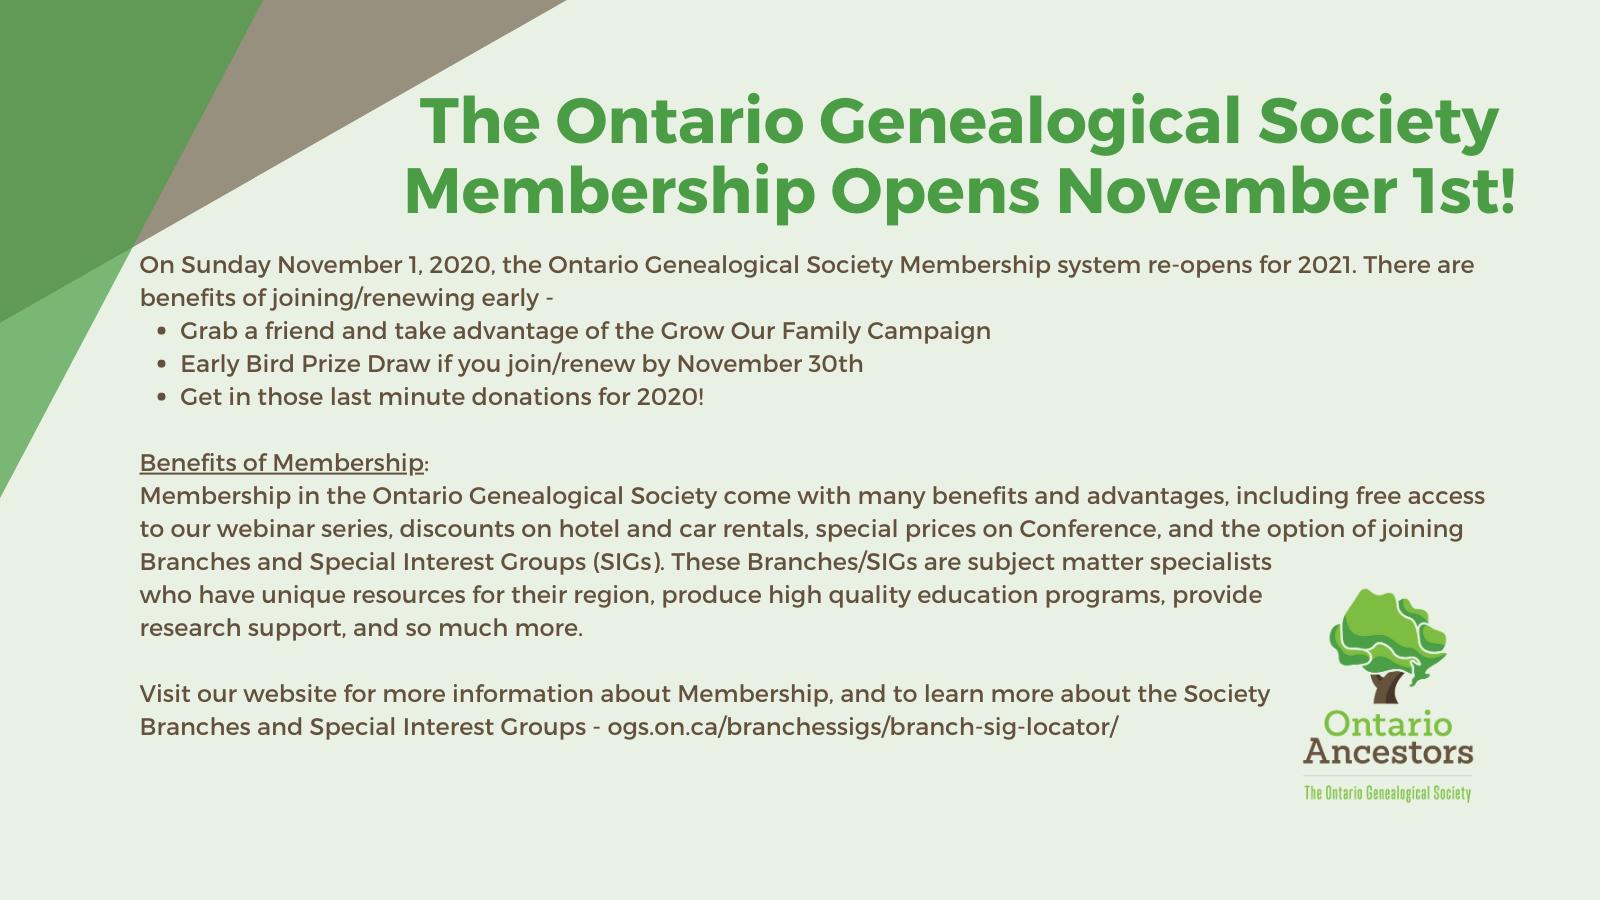 Ontario Genealogical Society Membership Opens November 1st